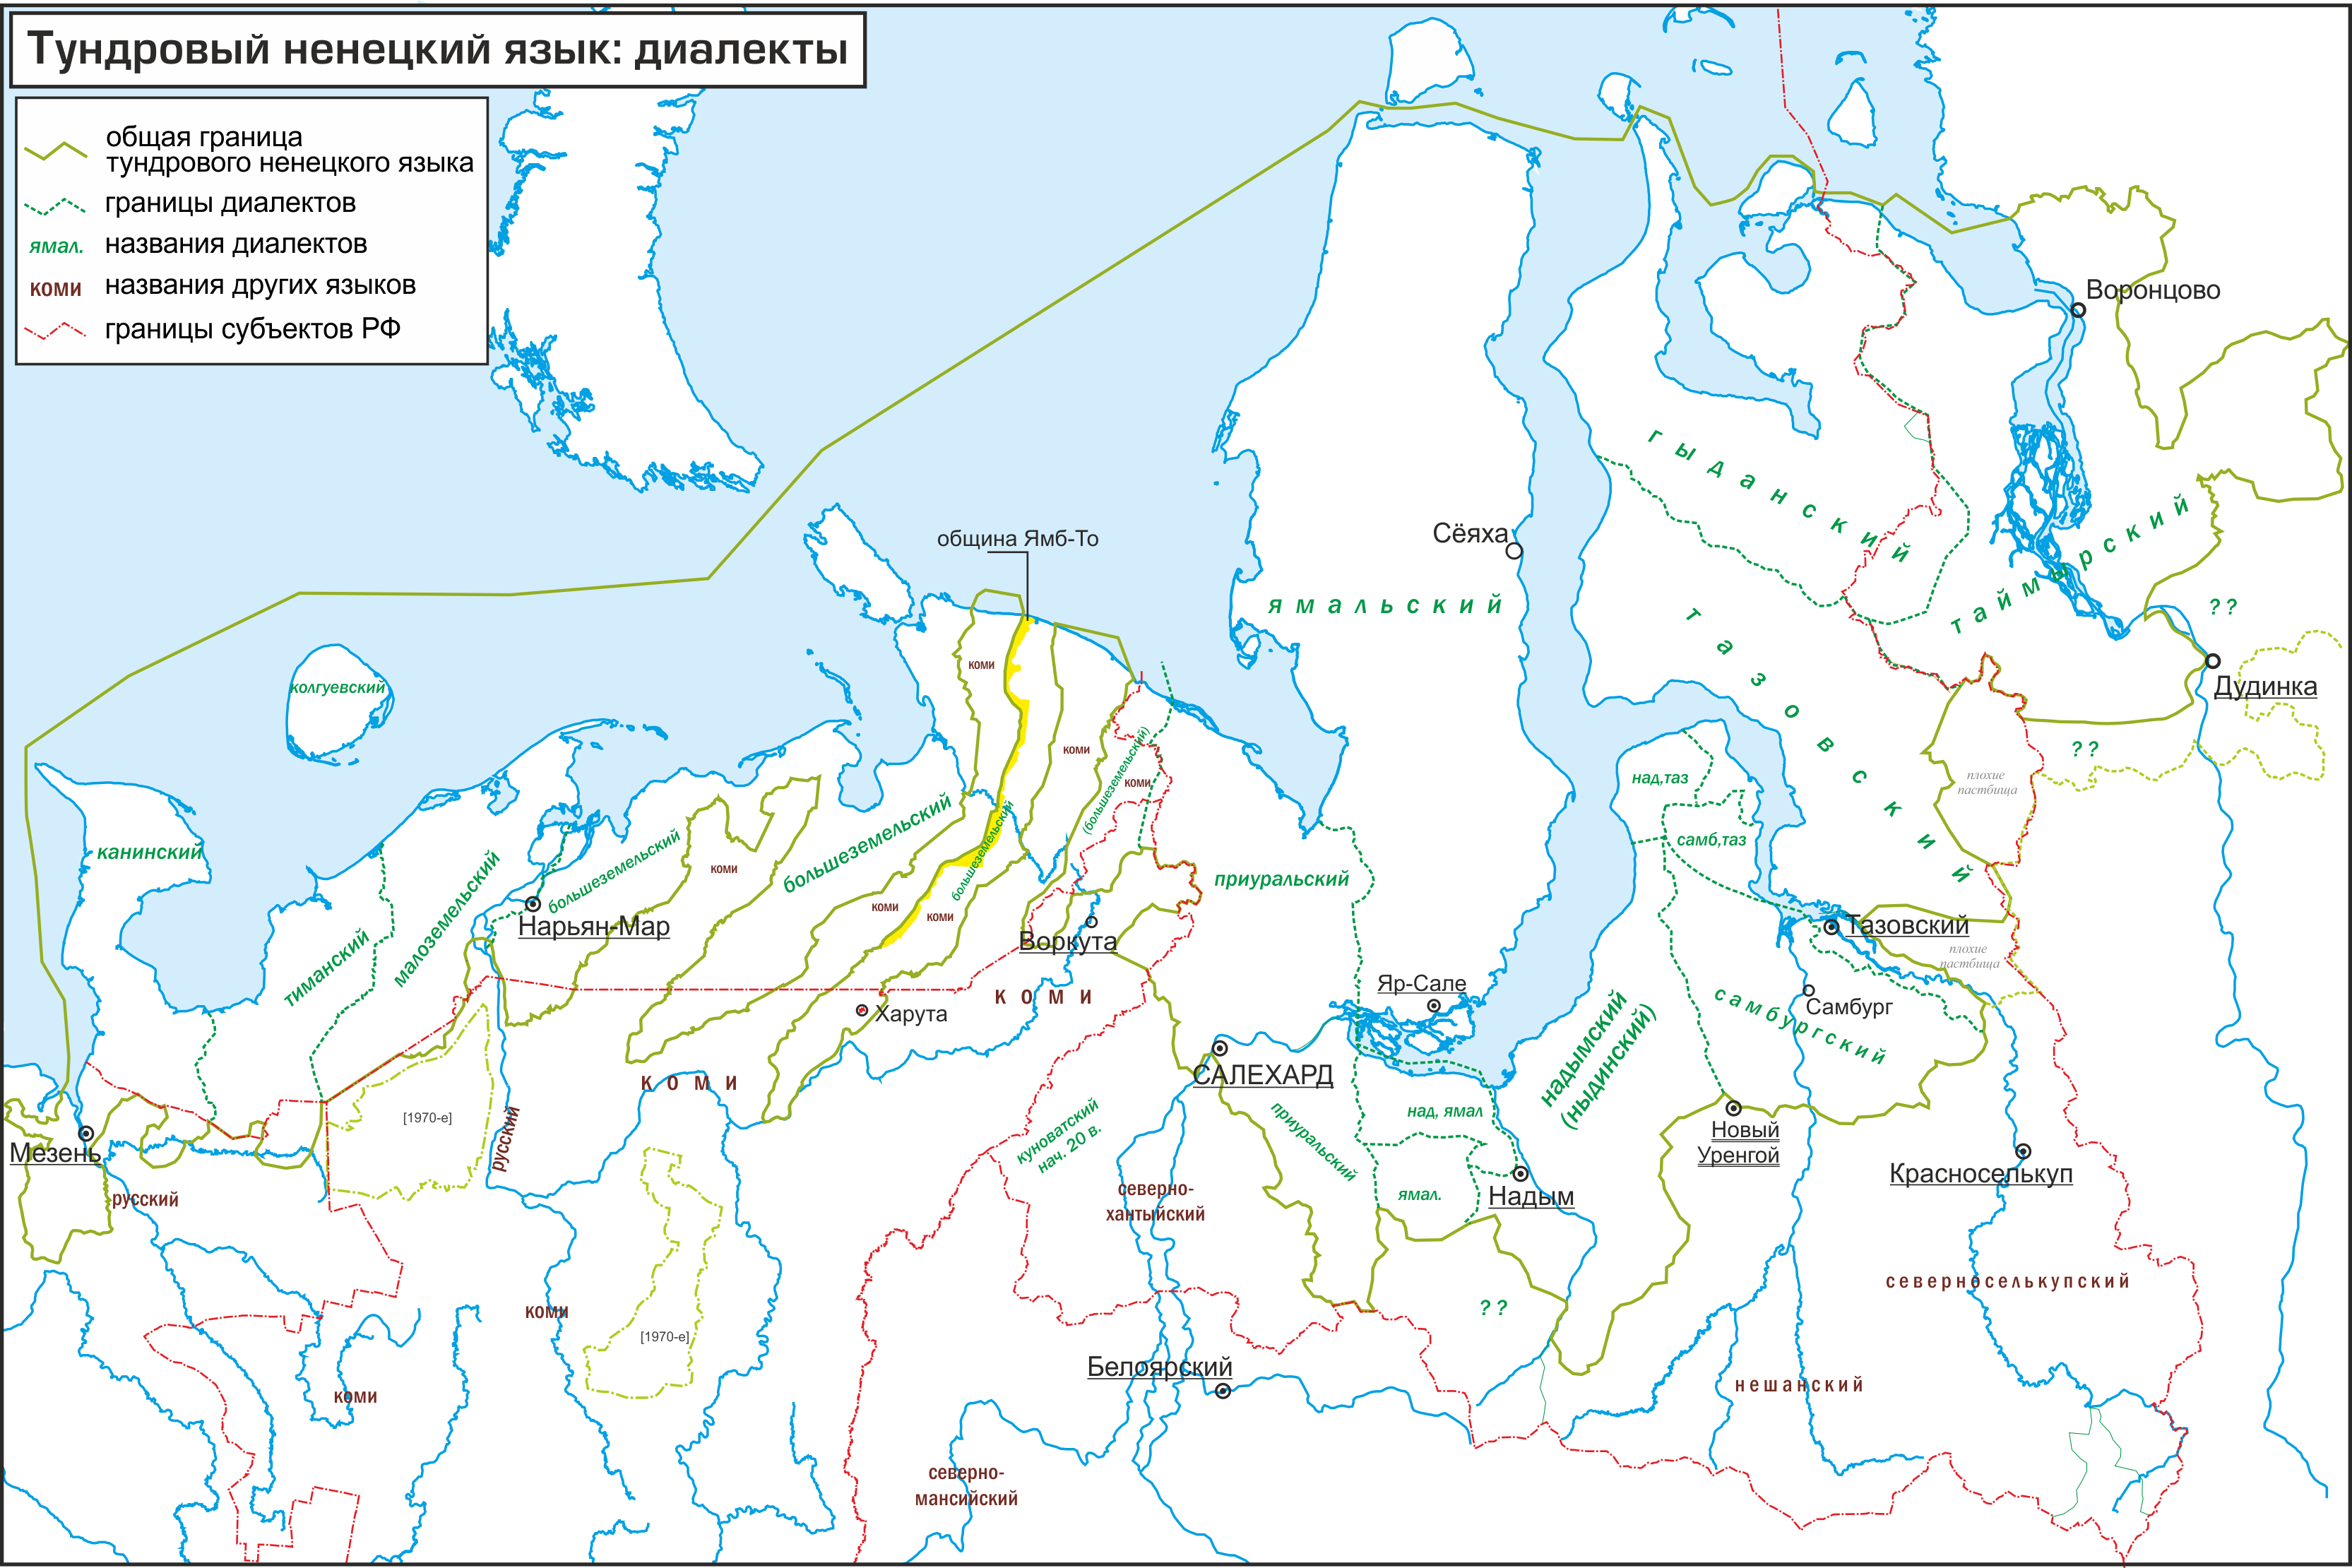 Ненецкие диалекты